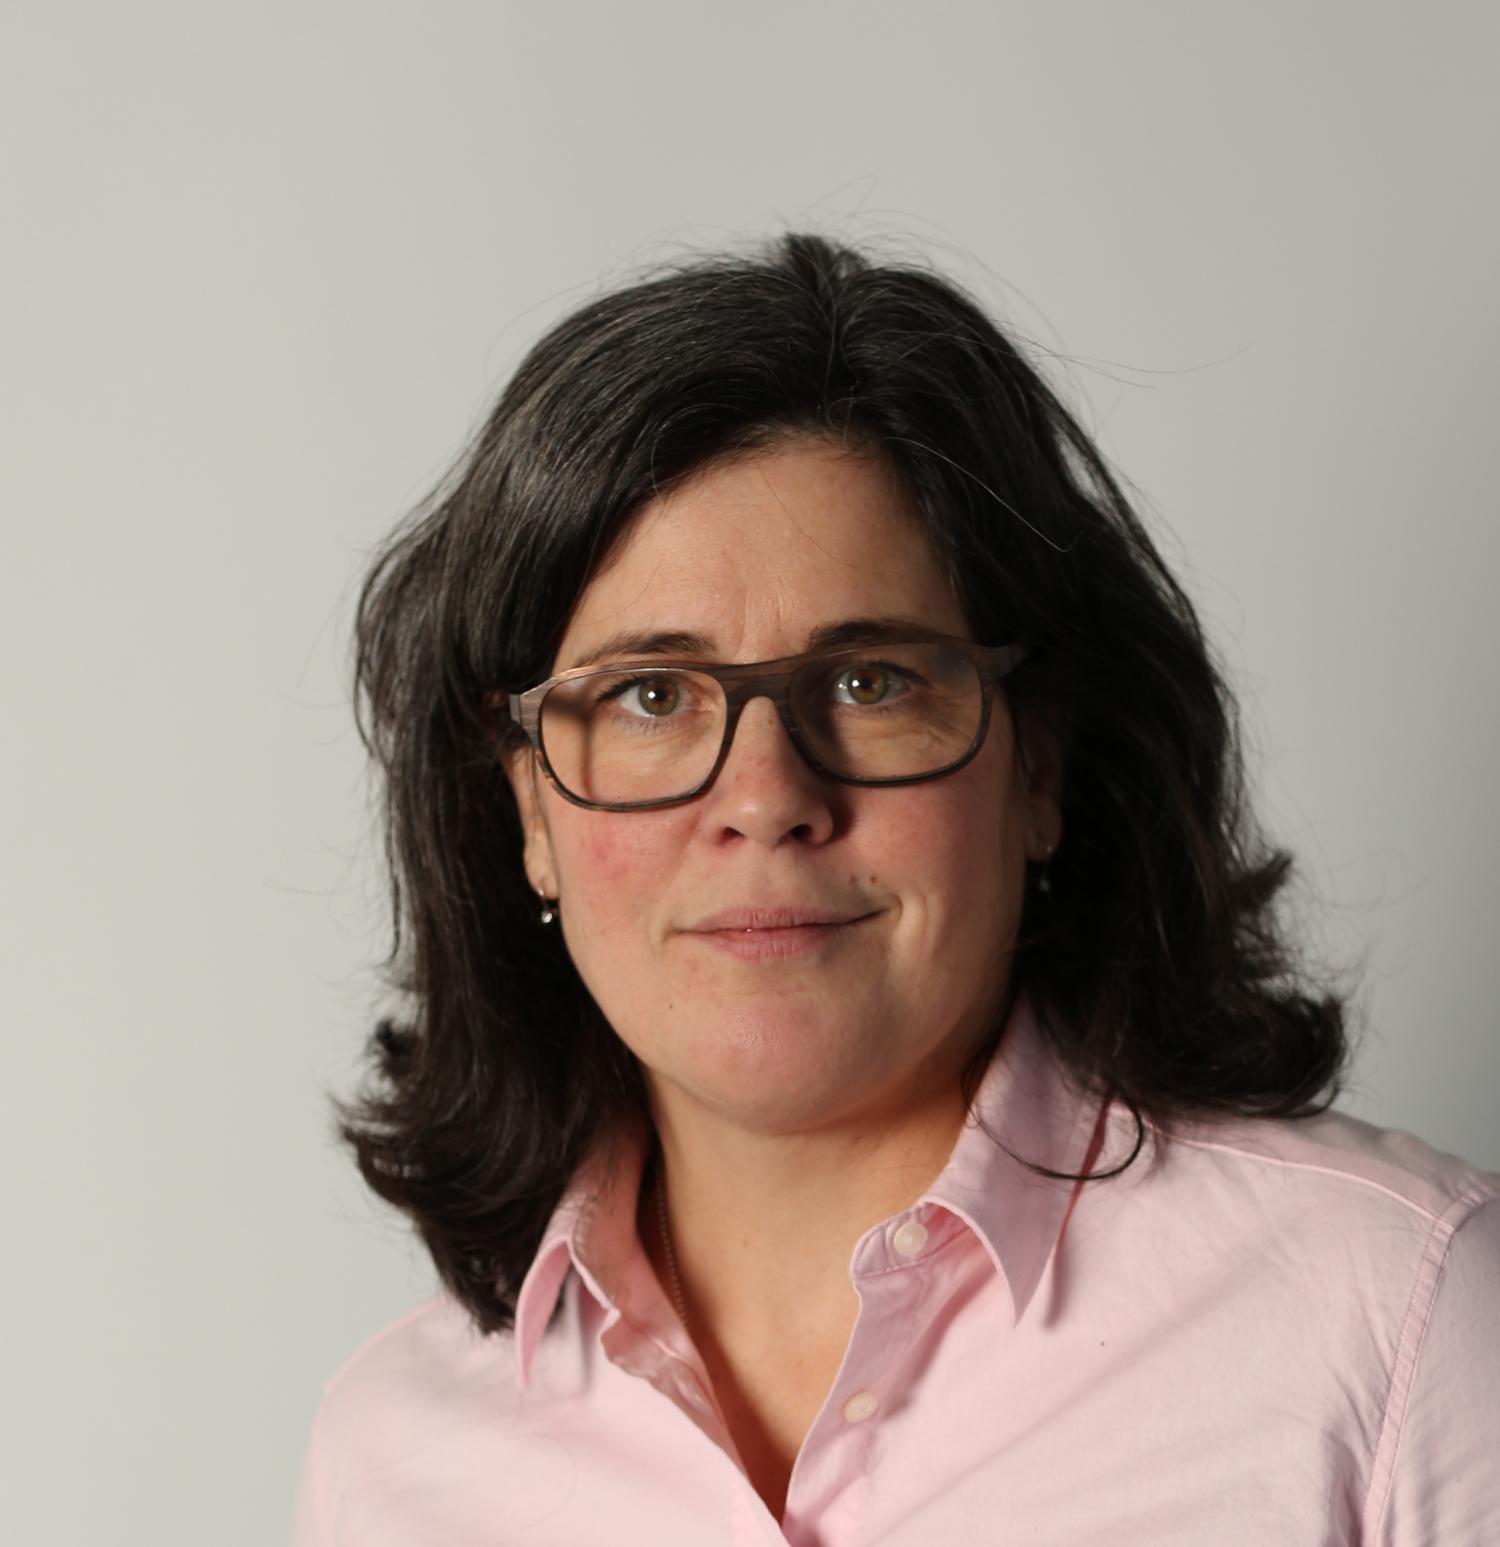 Annika Lindberg